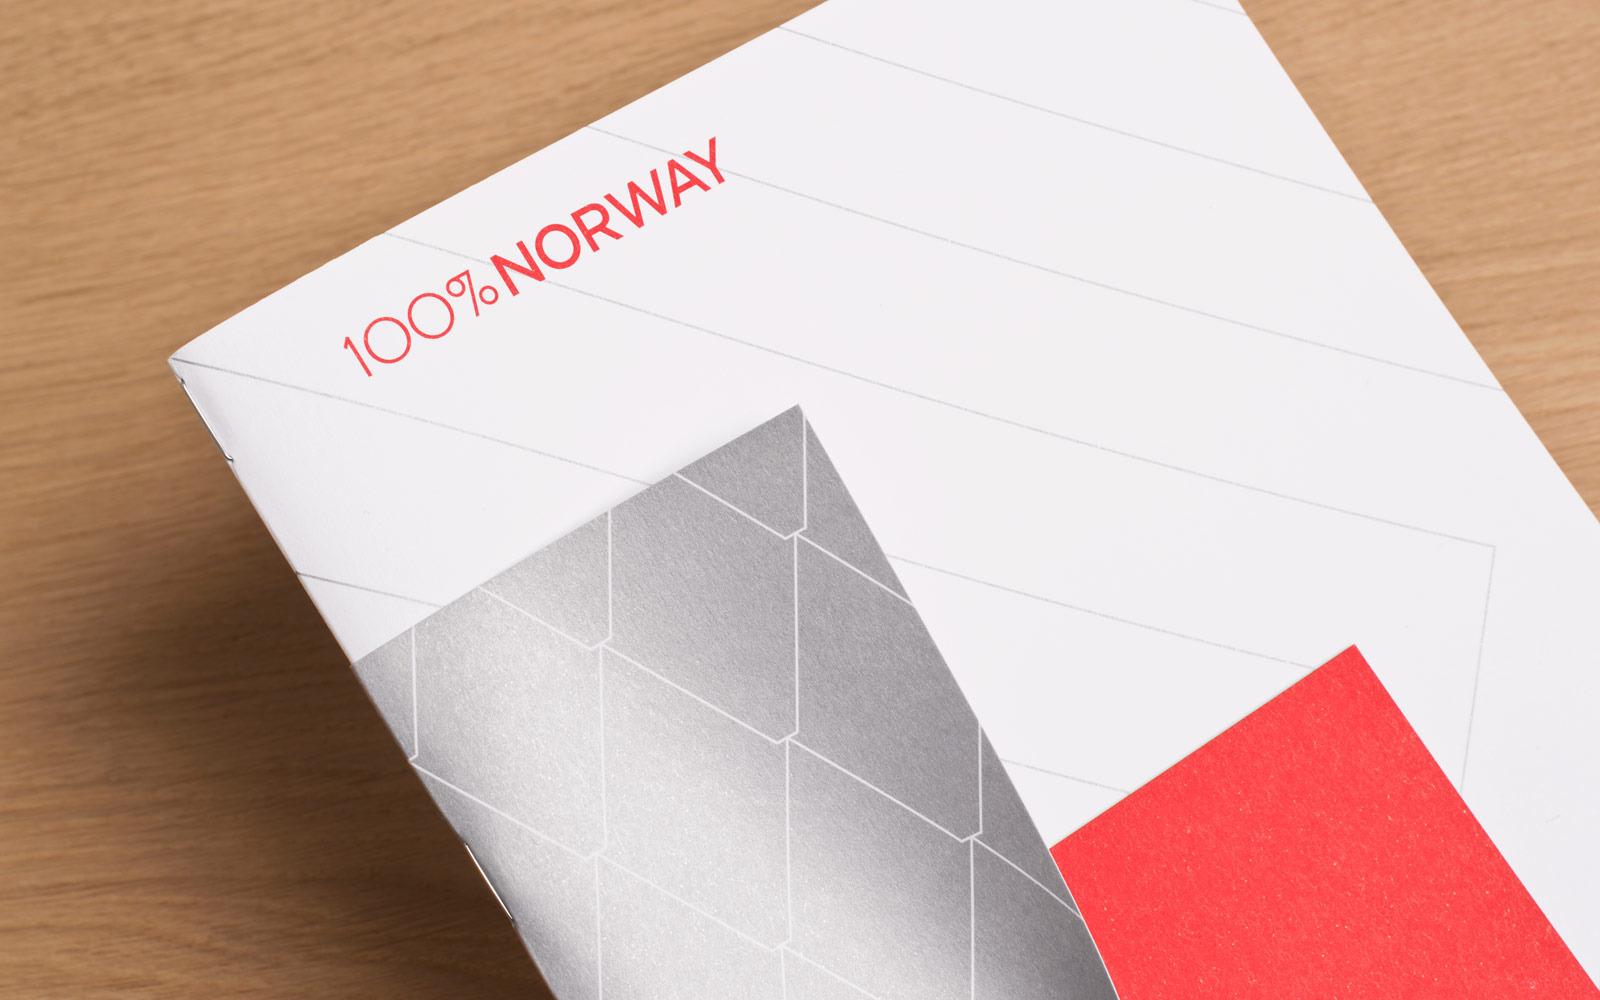 100% Norway - Heydays